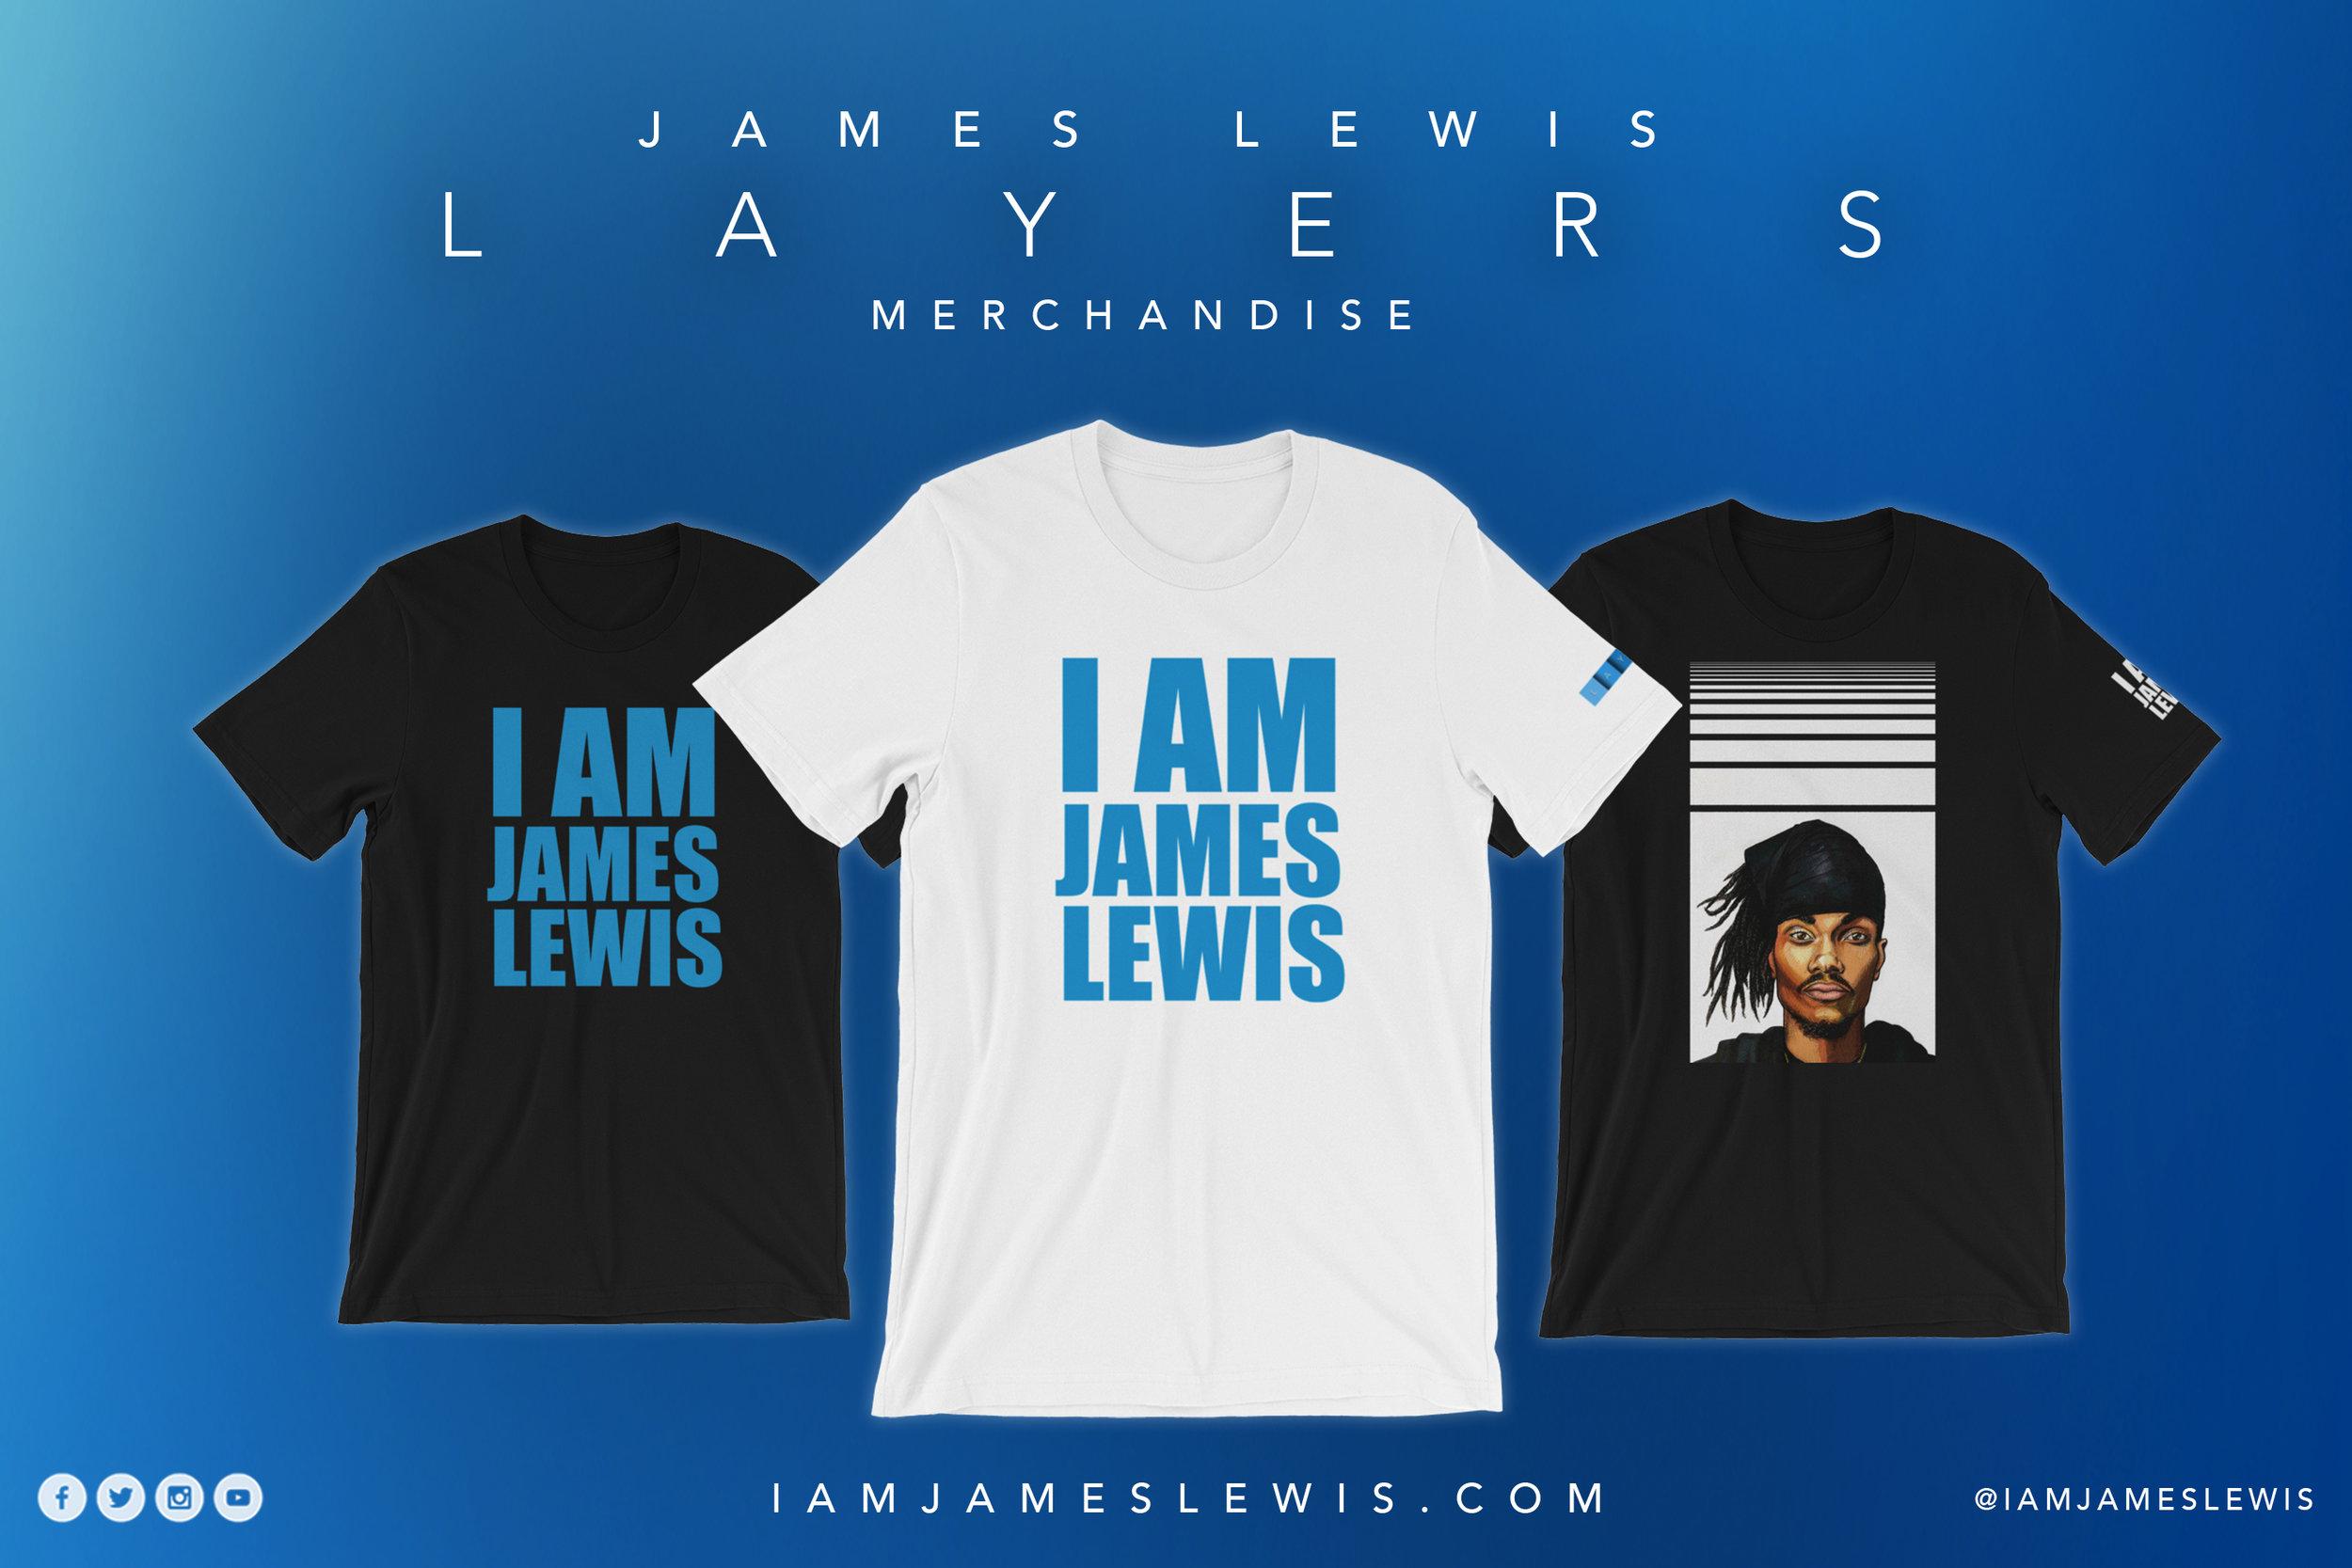 James Lewis Spotify iamjameslewis LAYERS Merchandise